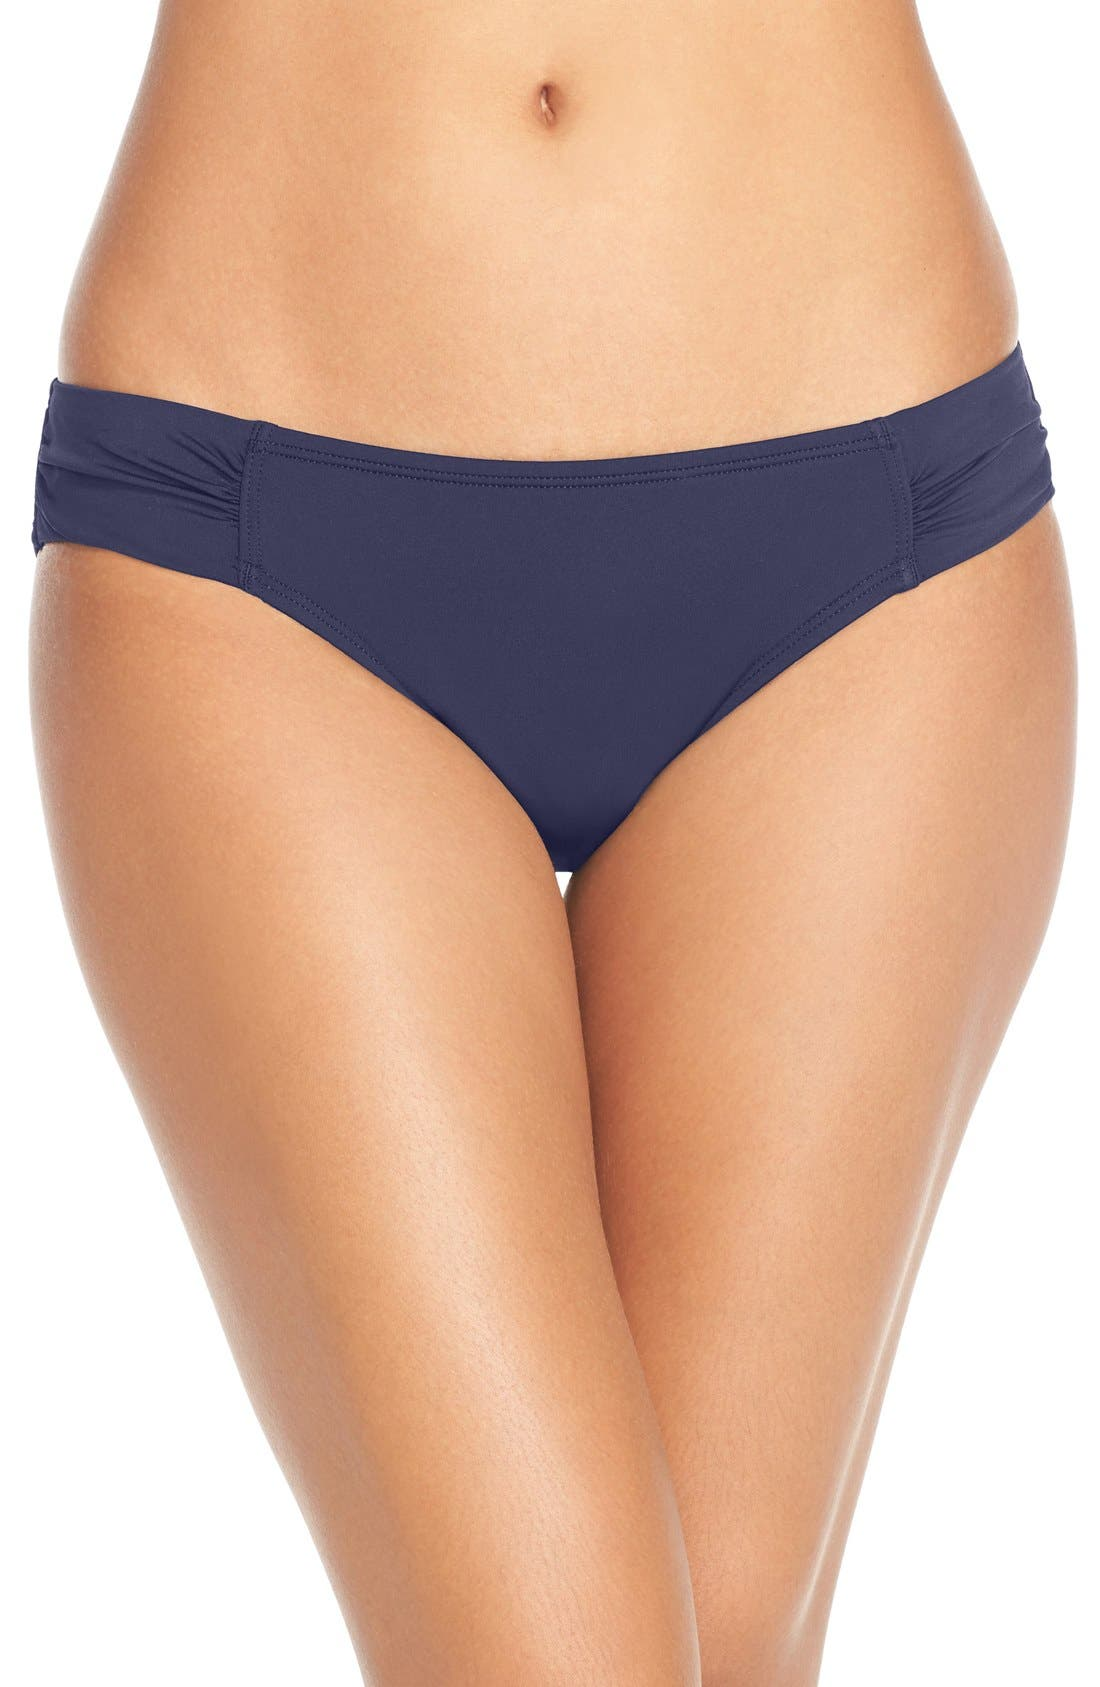 Alternate Image 1 Selected - Tommy Bahama Side Shirred Hipster Bikini Bottoms